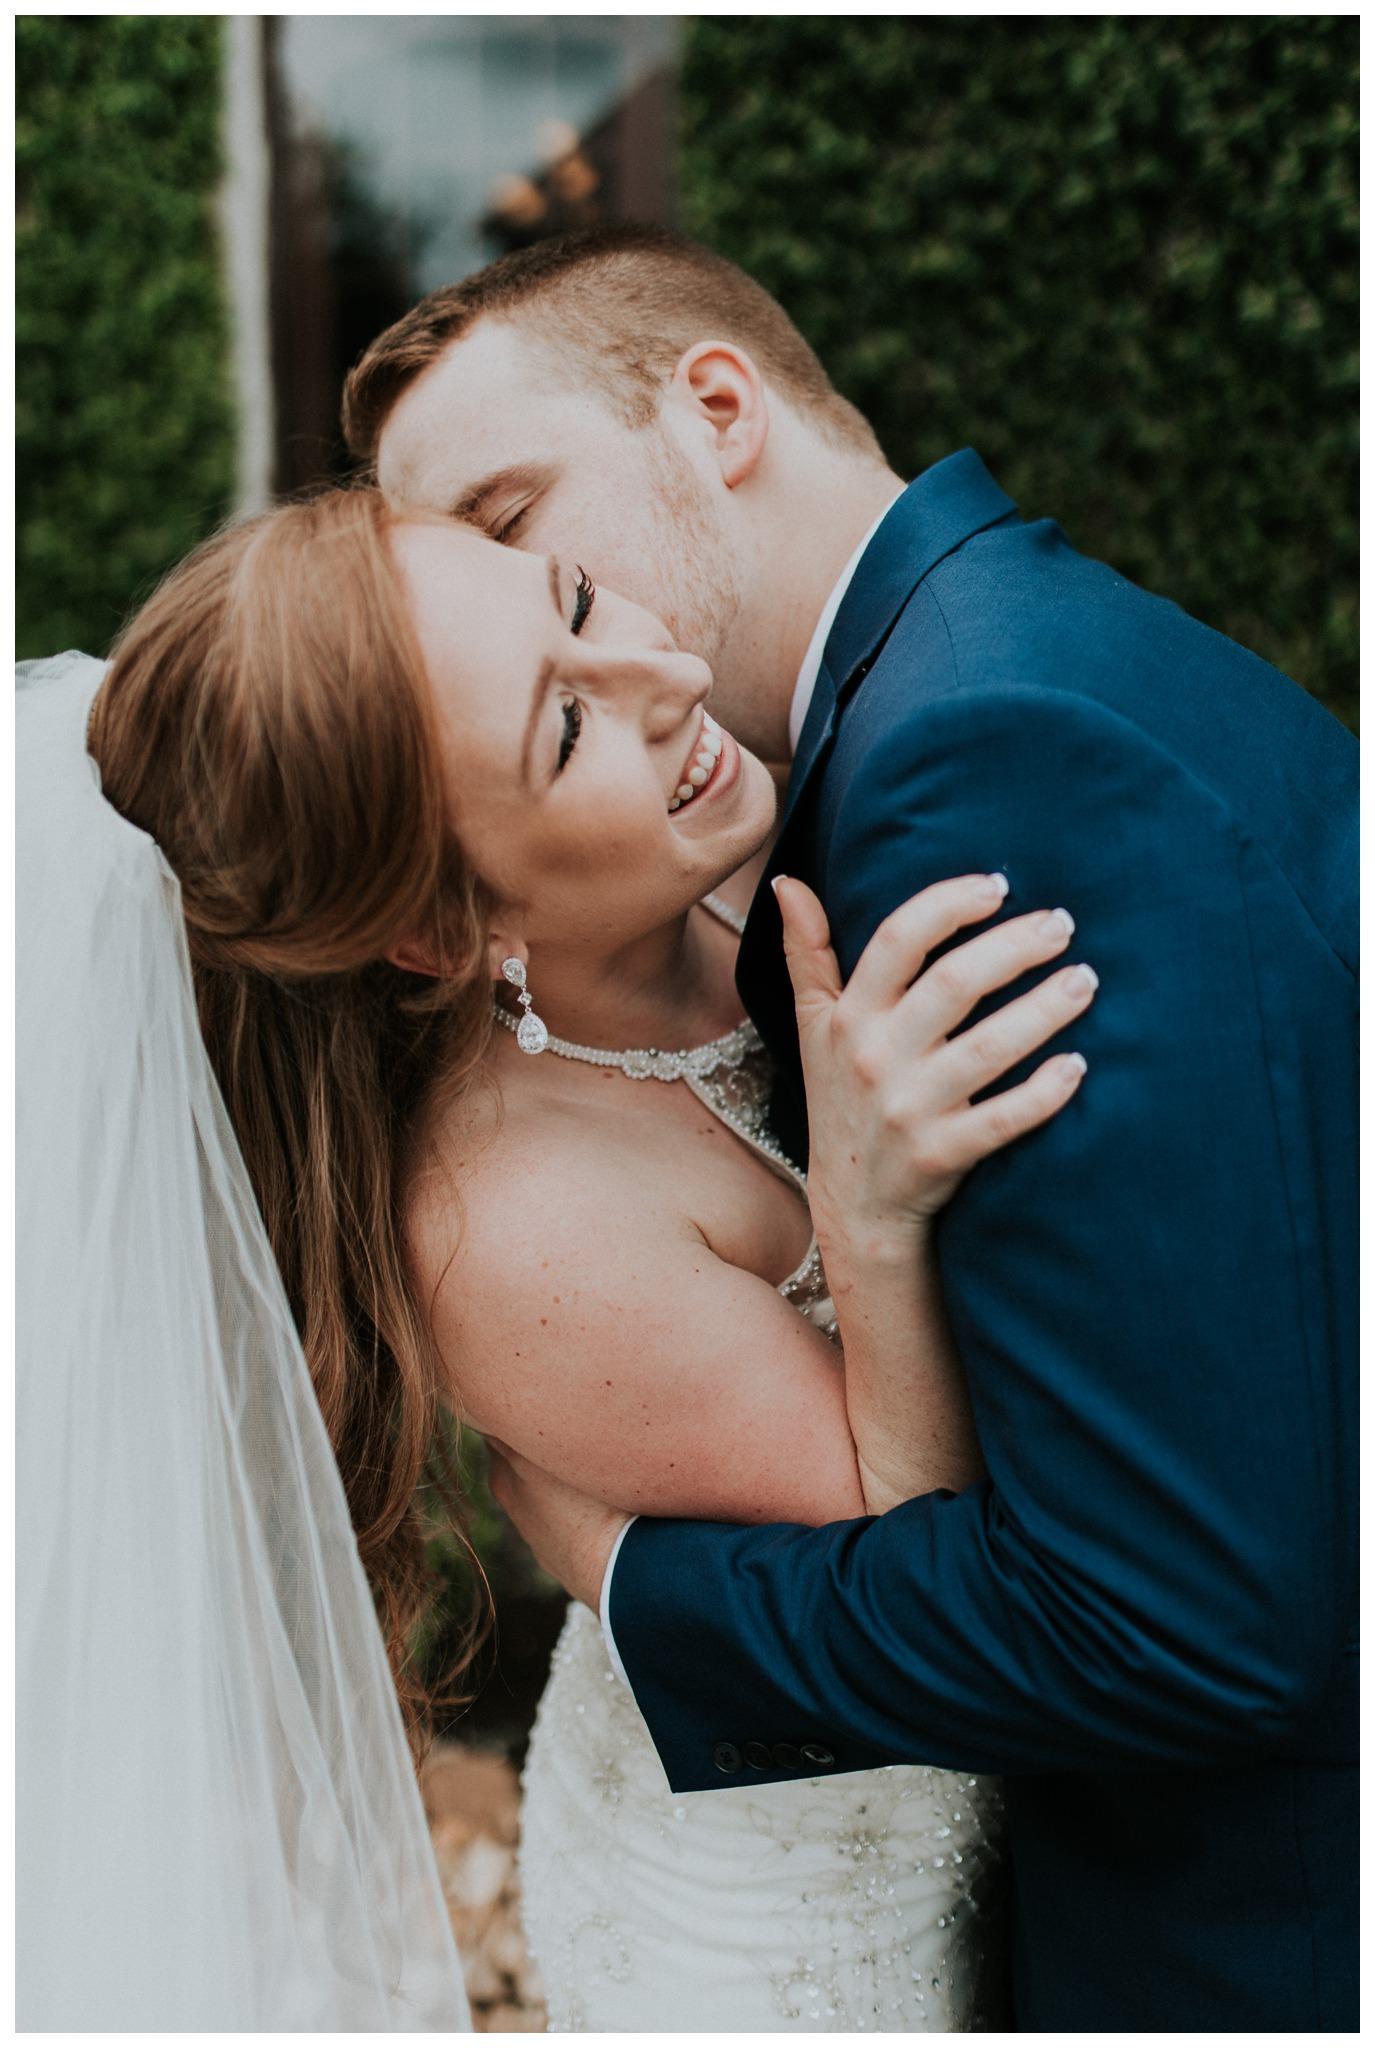 Summertime Olde Dobbin Station - Magnolia Wedding - The Woodlands Texas Wedding Photographer-2407.jpg